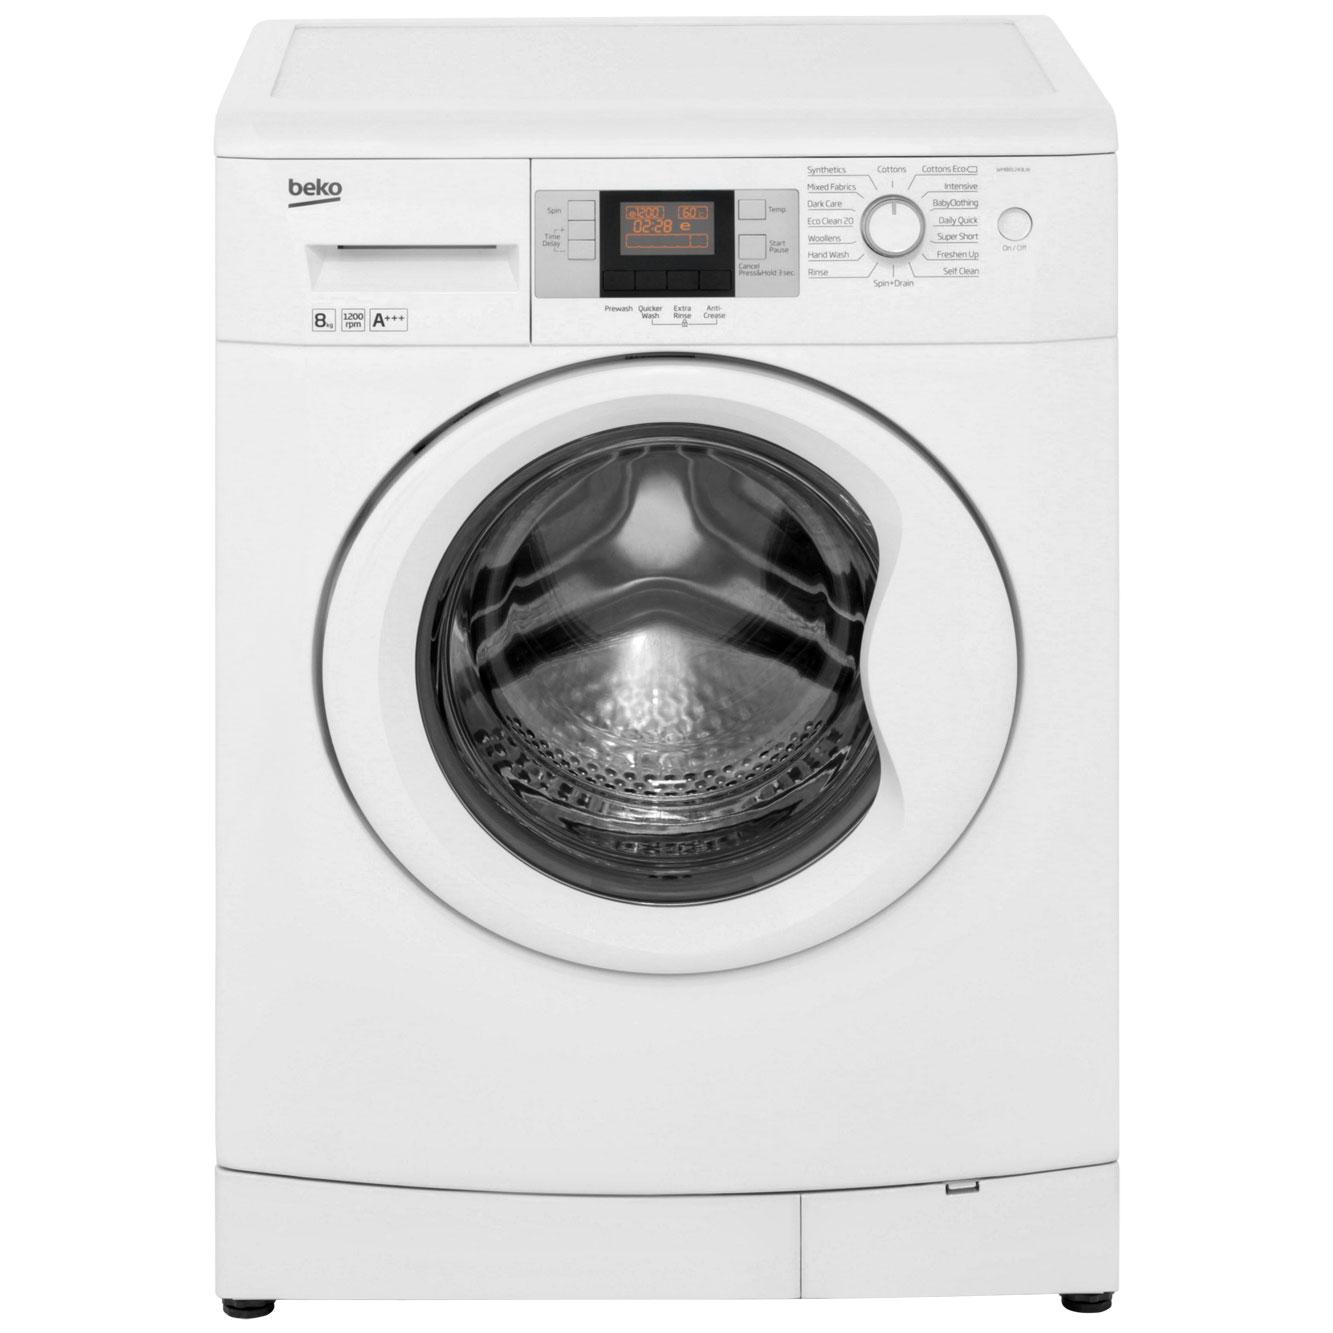 Beko WMB81243LW Free Standing Washing Machine in White